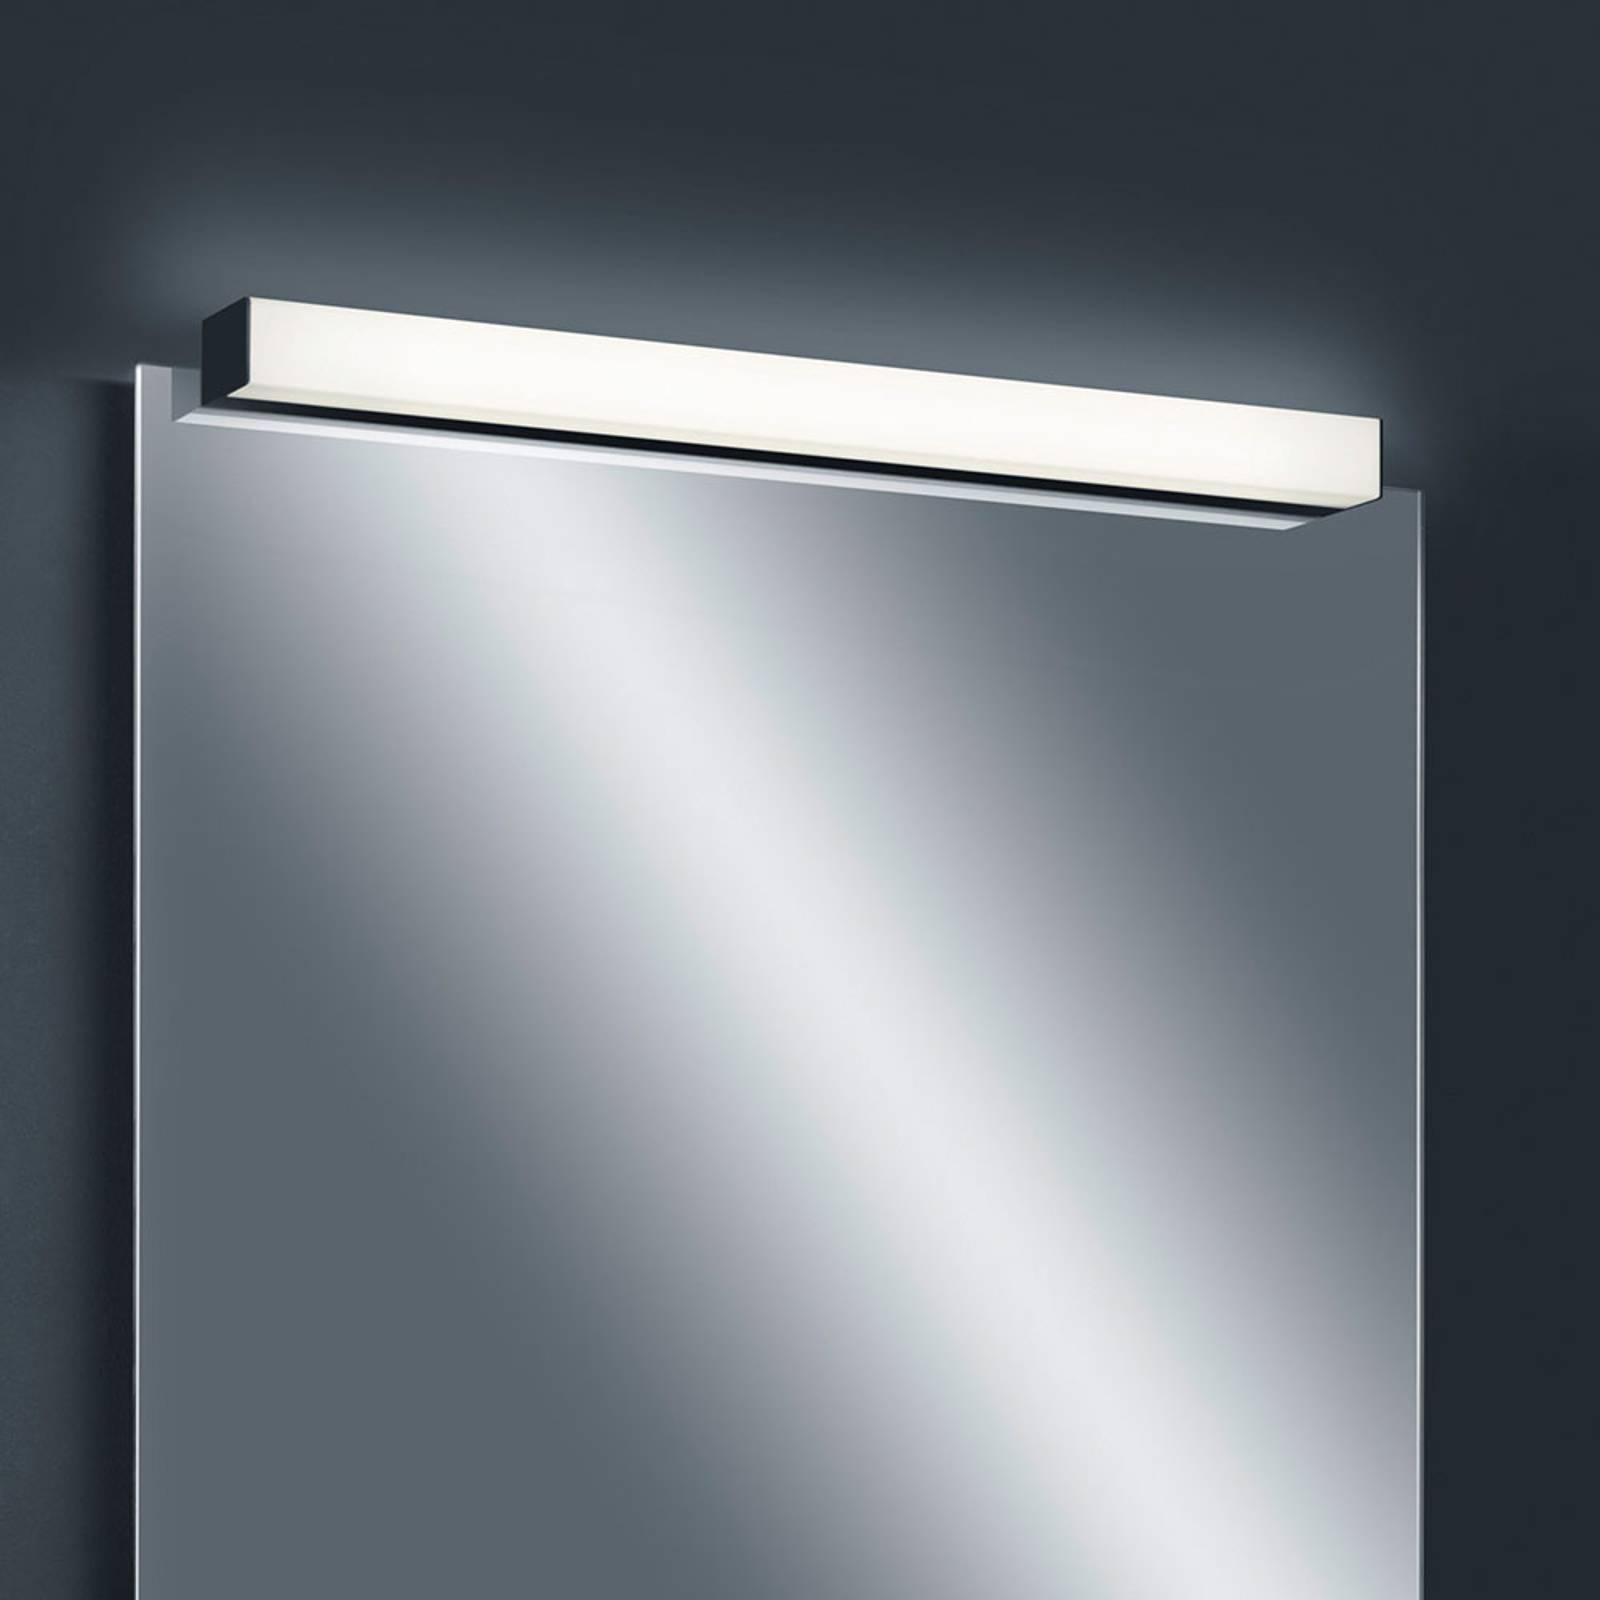 Helestra Lado -LED-peililamppu musta 90 cm